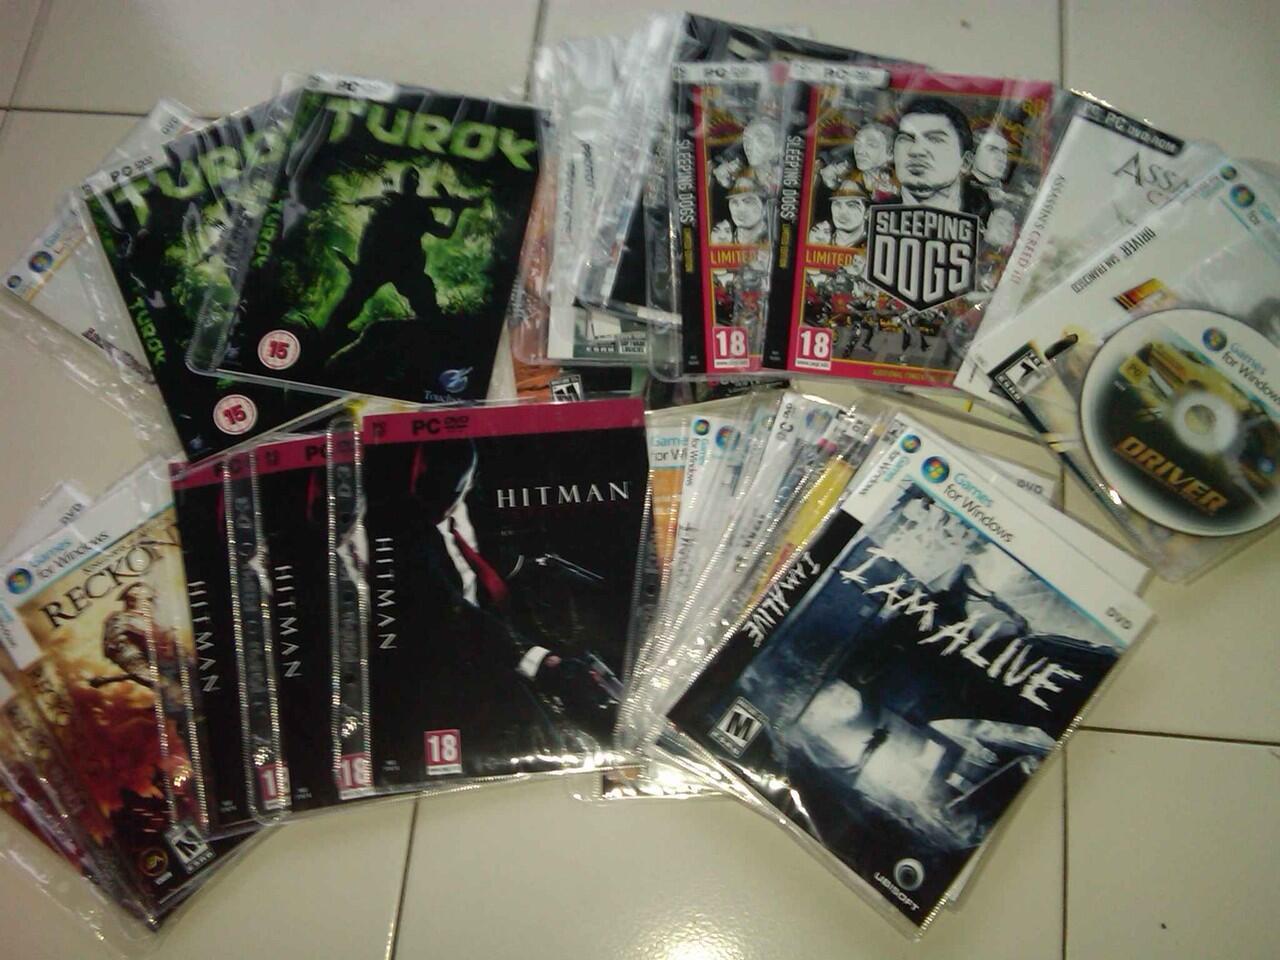 DVD GAMES PC BANDUNG PAKET COVER PC GAMES TERMURAH 3500/DVD